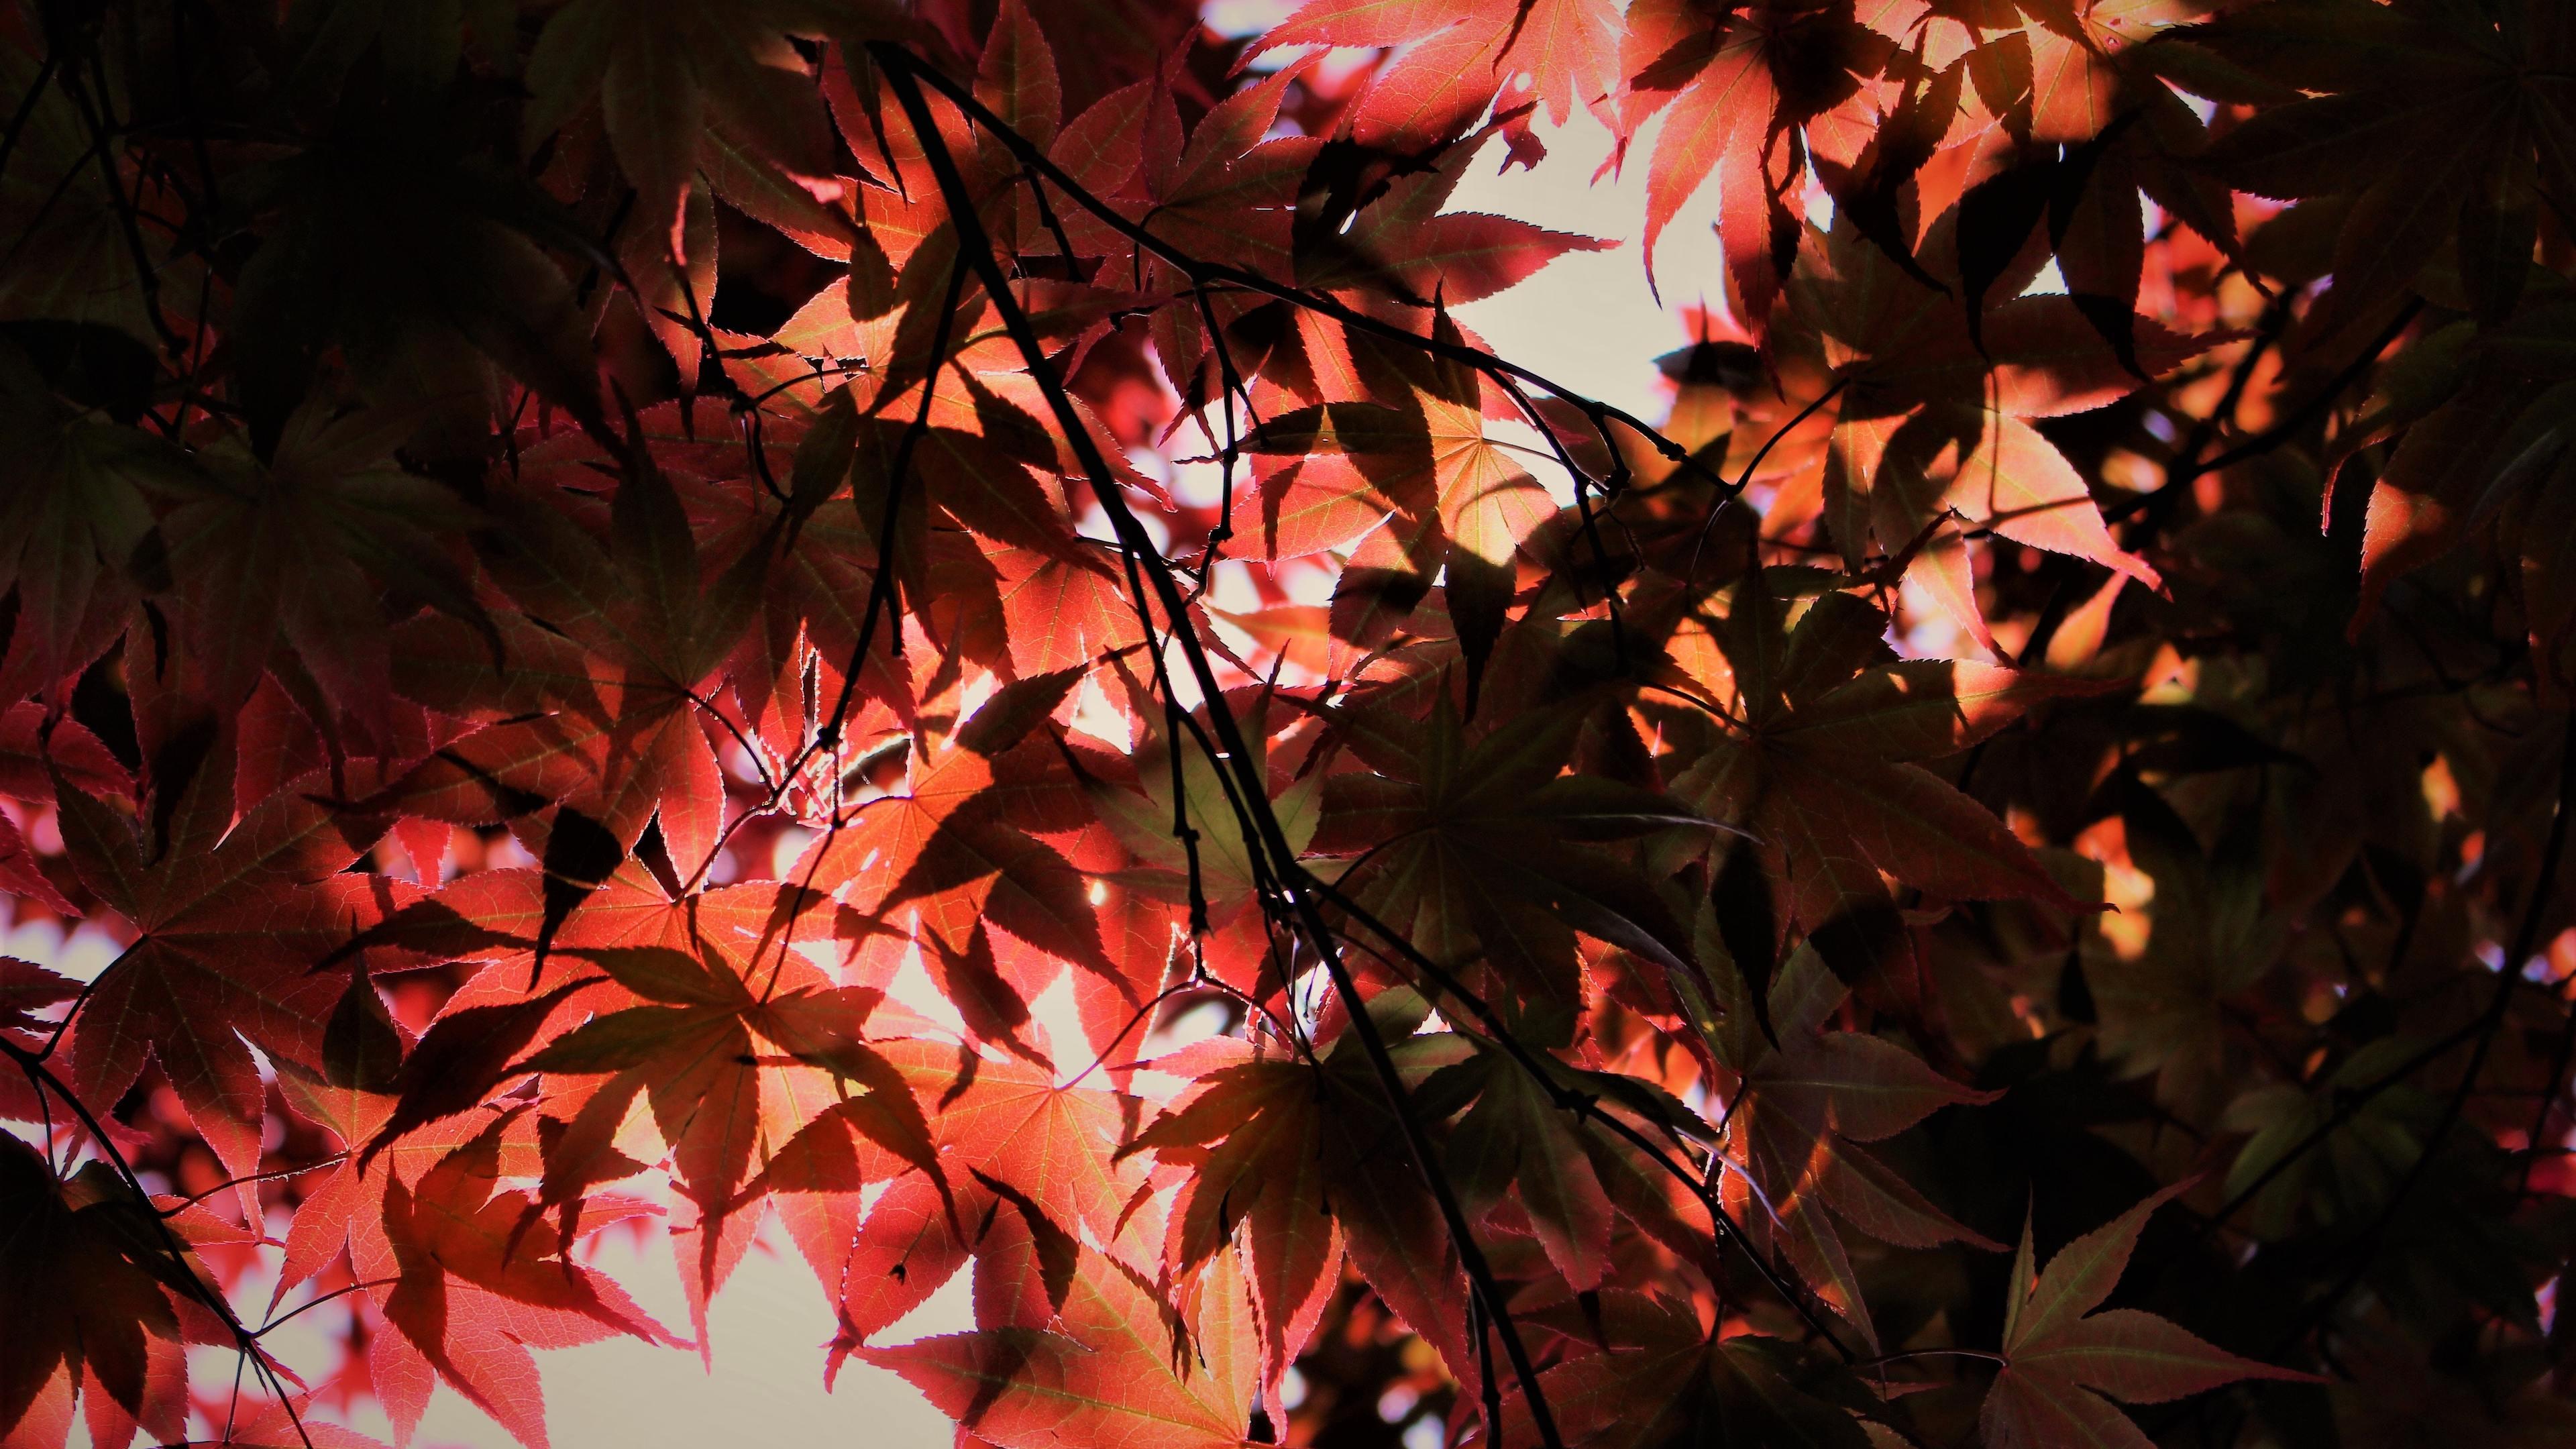 red autumn season leaves 4k 1540141090 - Red Autumn Season Leaves 4k - season wallpapers, red wallpapers, nature wallpapers, leaves wallpapers, hd-wallpapers, autumn wallpapers, 5k wallpapers, 4k-wallpapers